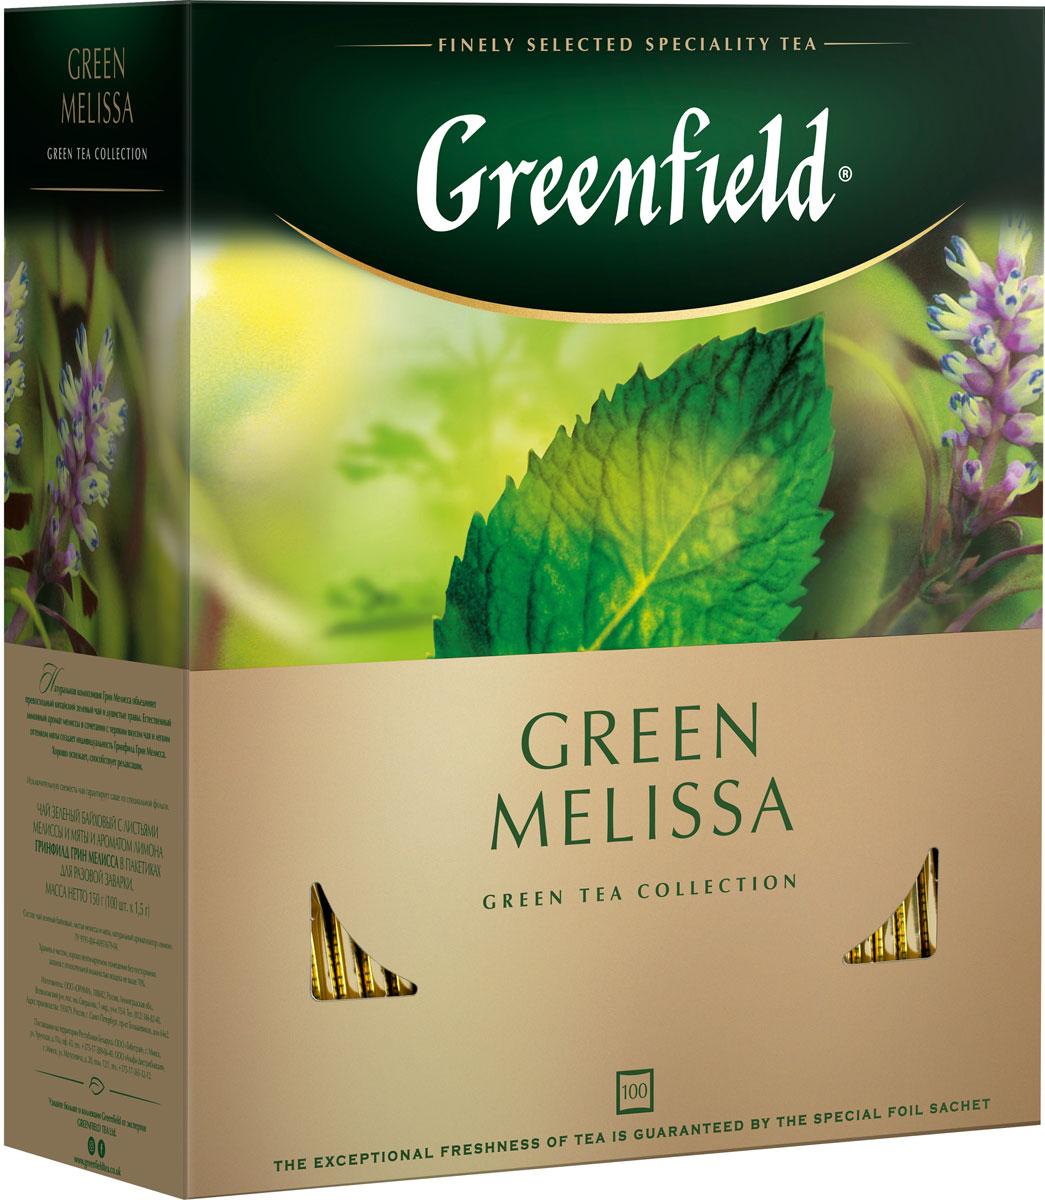 Greenfield Green Melissa зеленый чай в пакетиках, 100 шт john greenfield power from on high